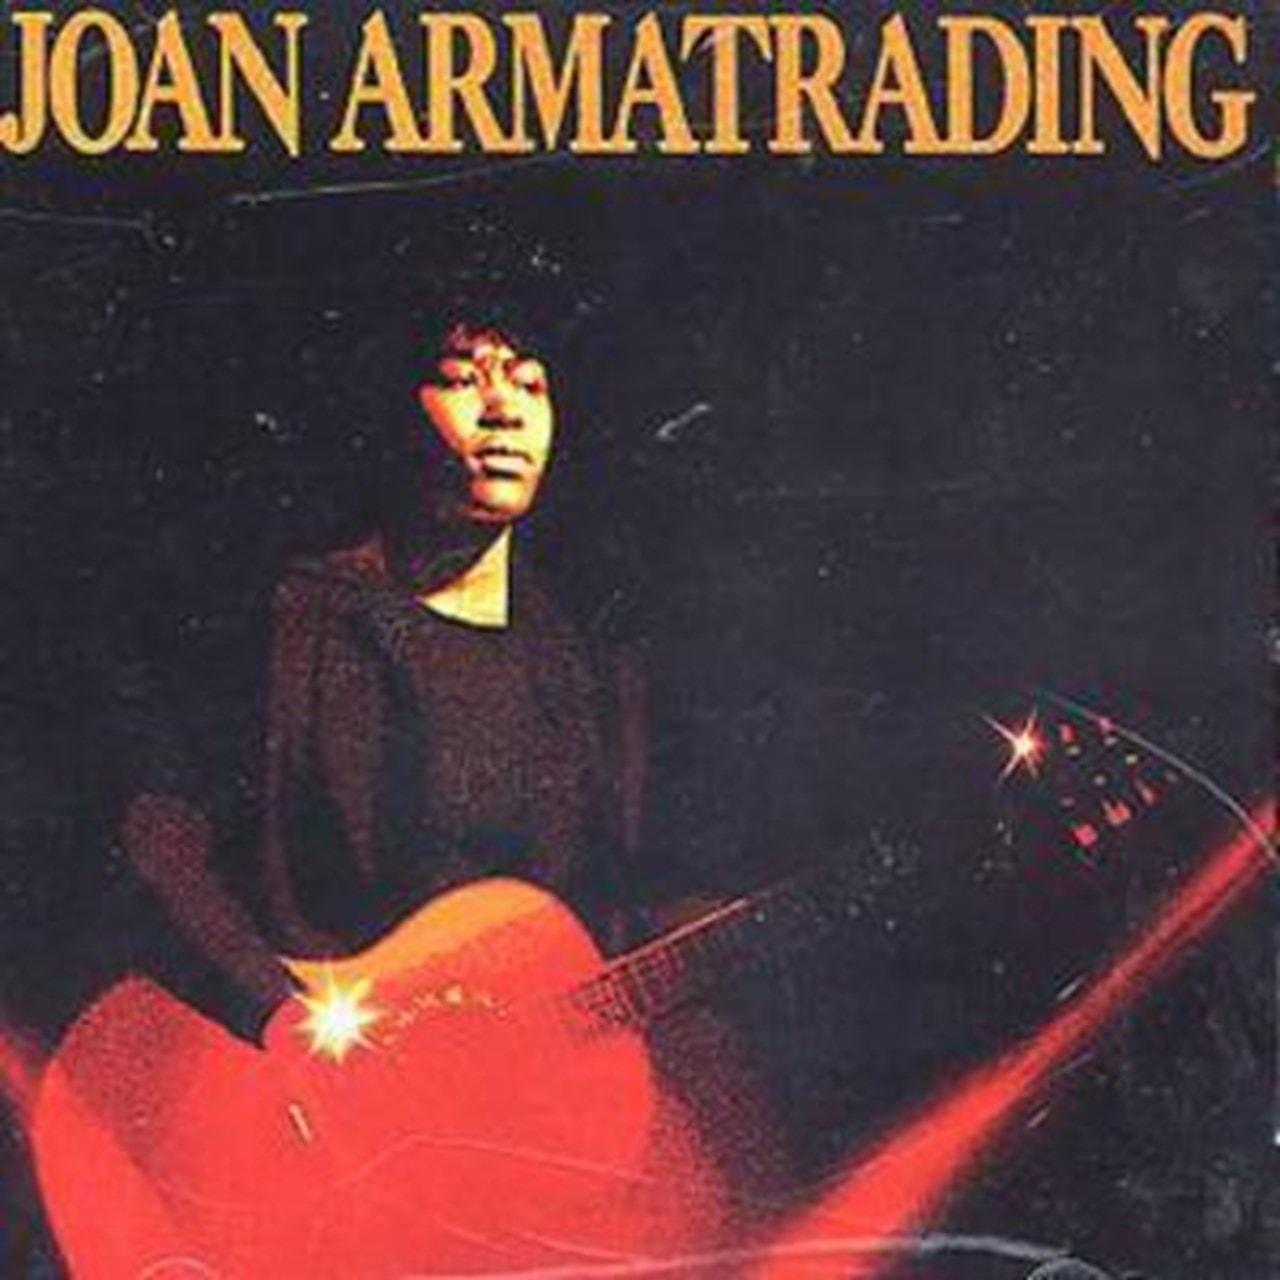 Joan Armatrading - 1